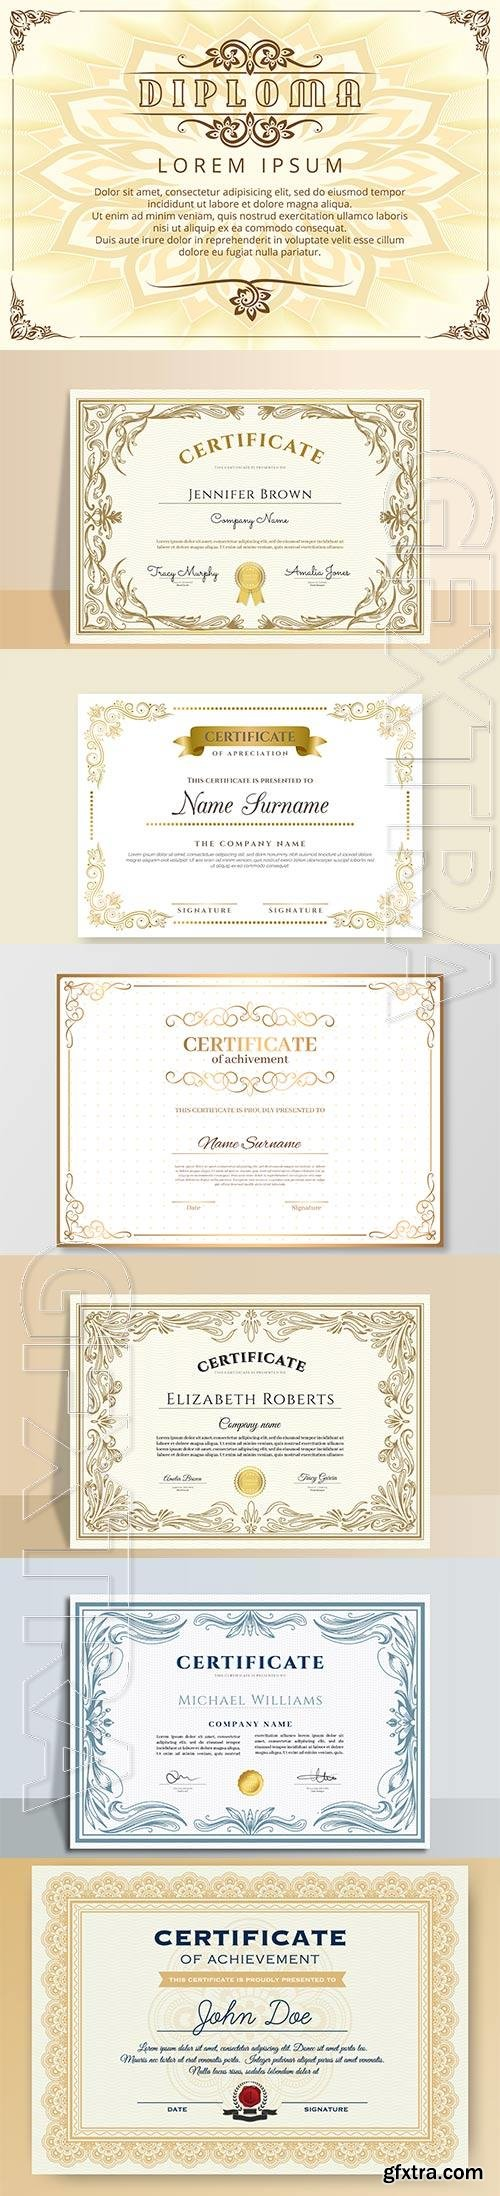 Engraving hand drawn ornamental vector certificate